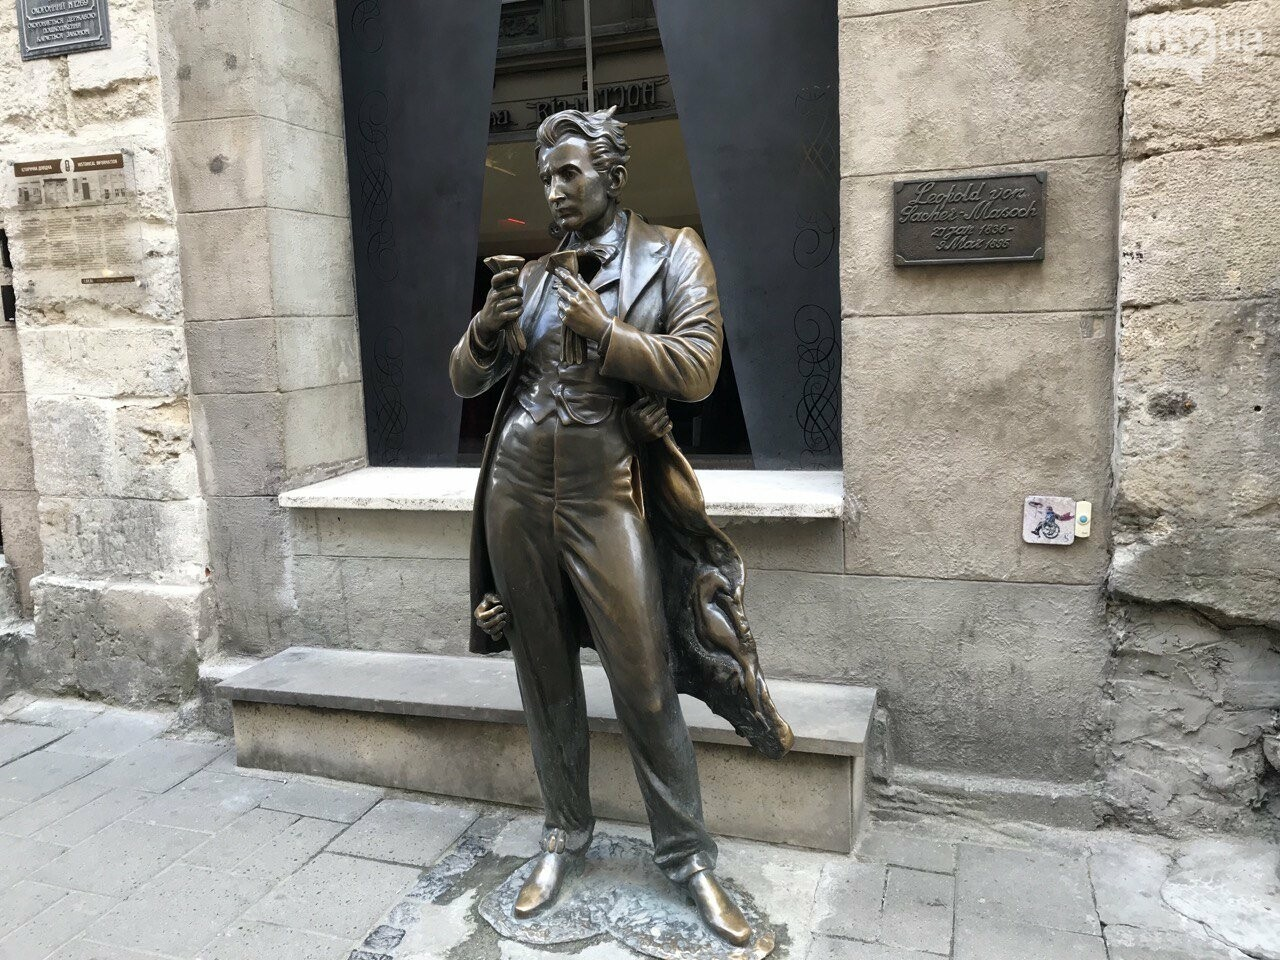 Пам'ятник Леопольдові фон Захер-Мазоху, Фото: 032.ua